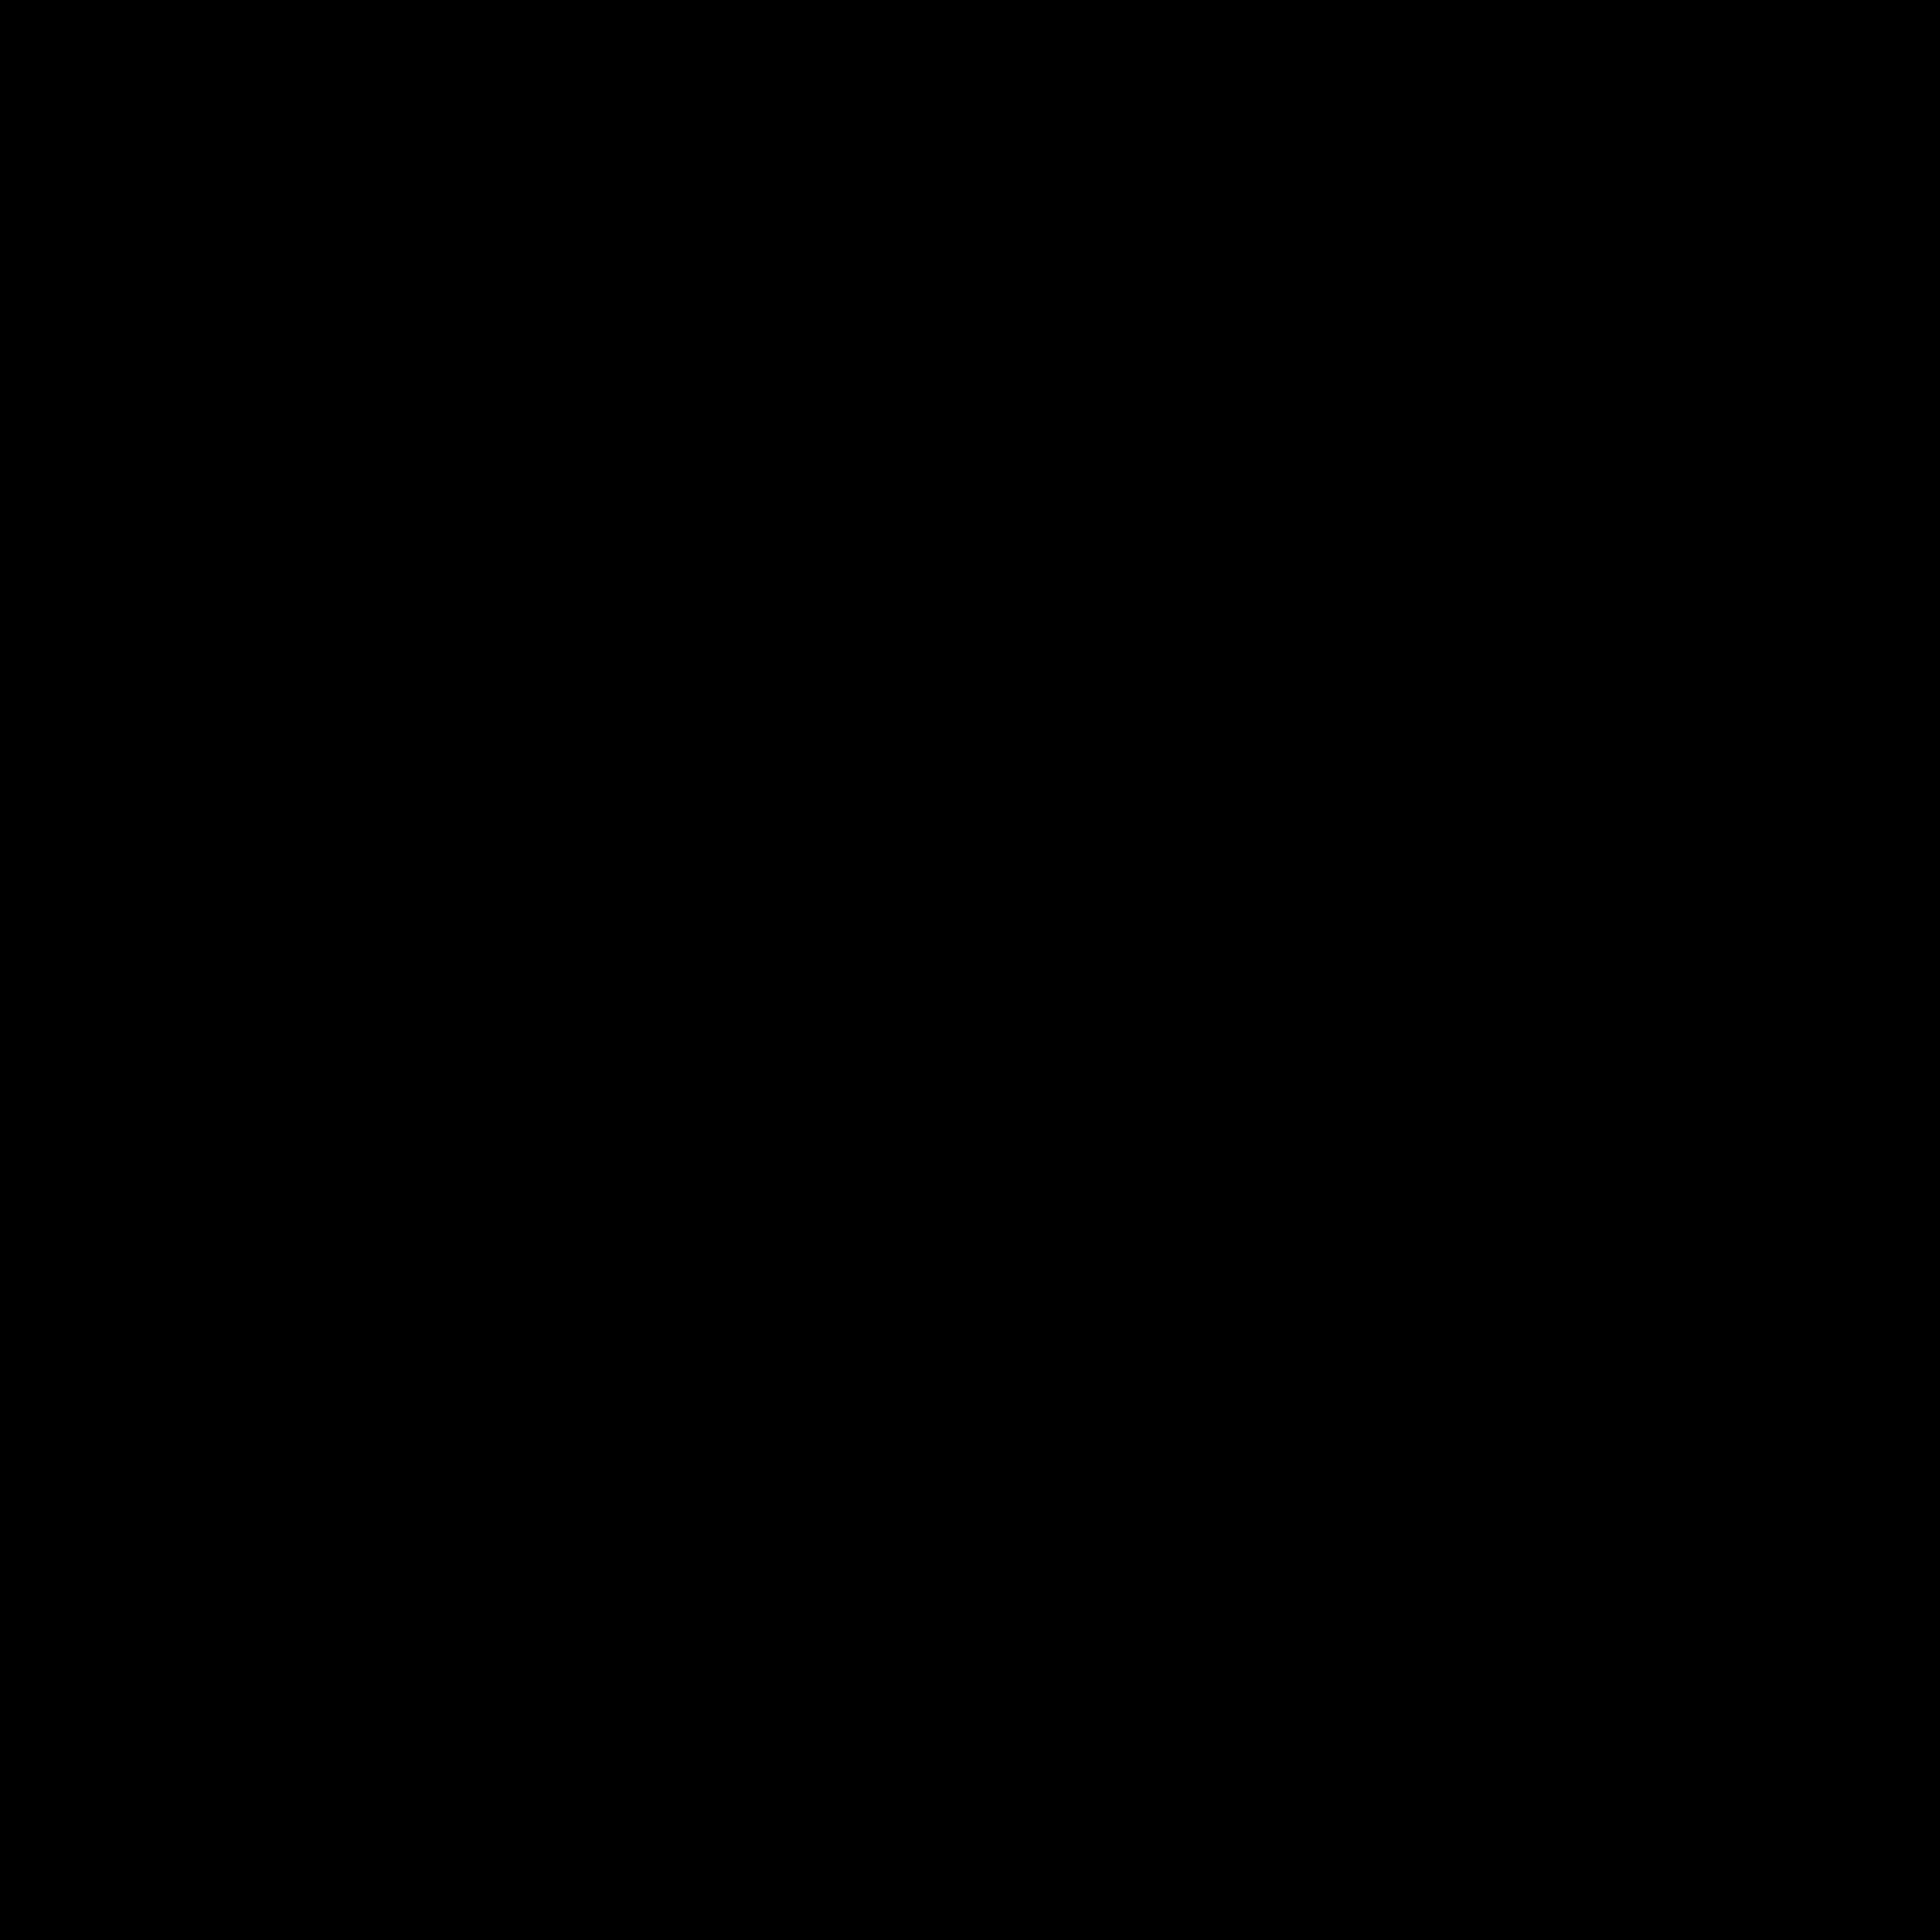 rds-2-logo-png-transparent